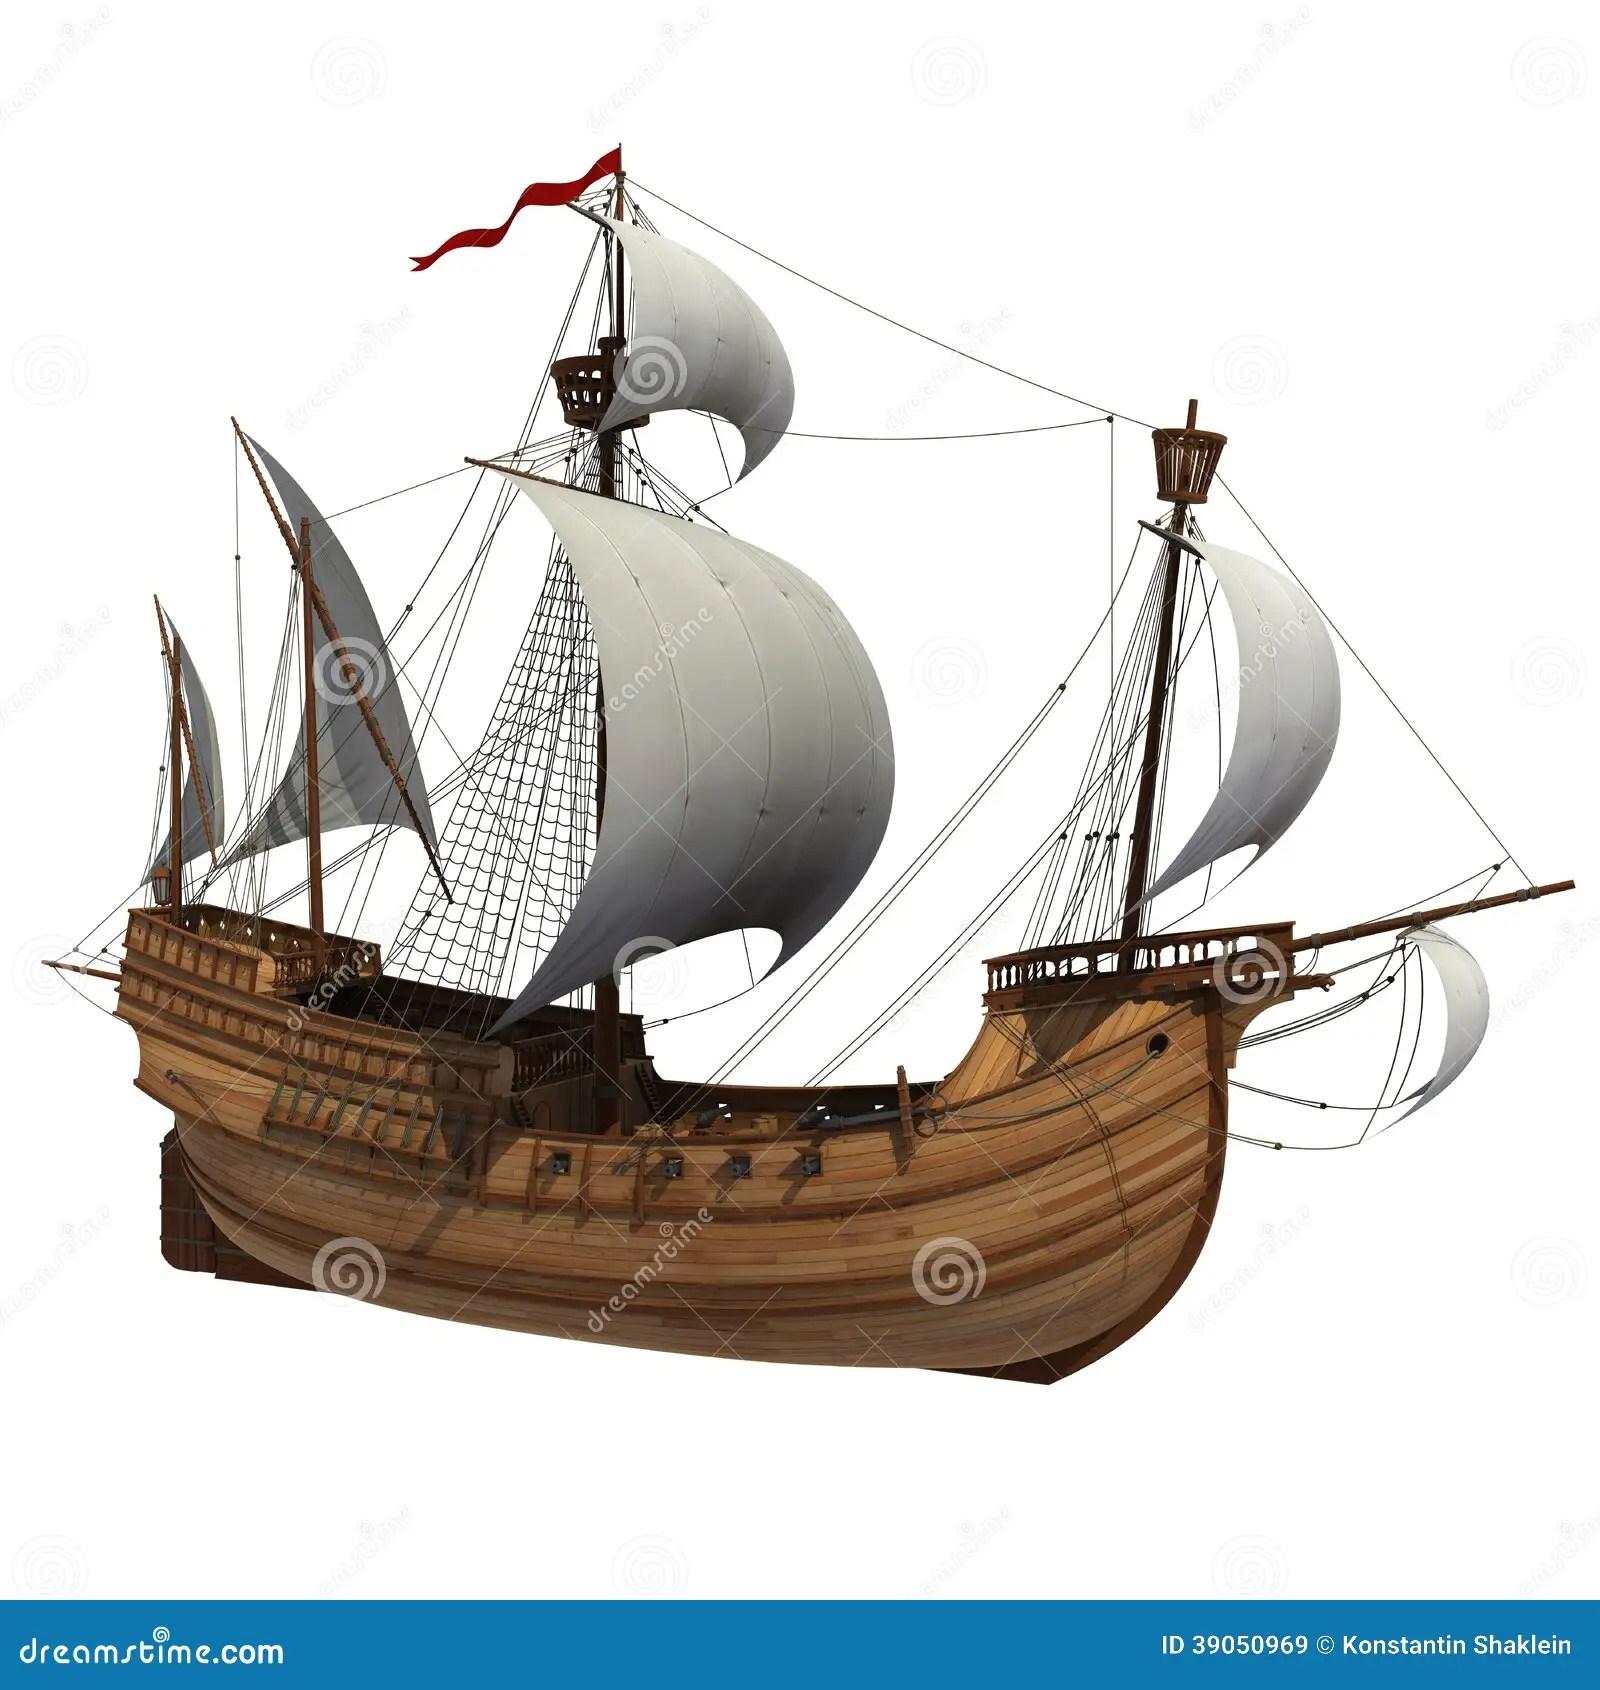 diagram of a caravel ship 1980 honda cb750 custom wiring stock illustration image 39050969